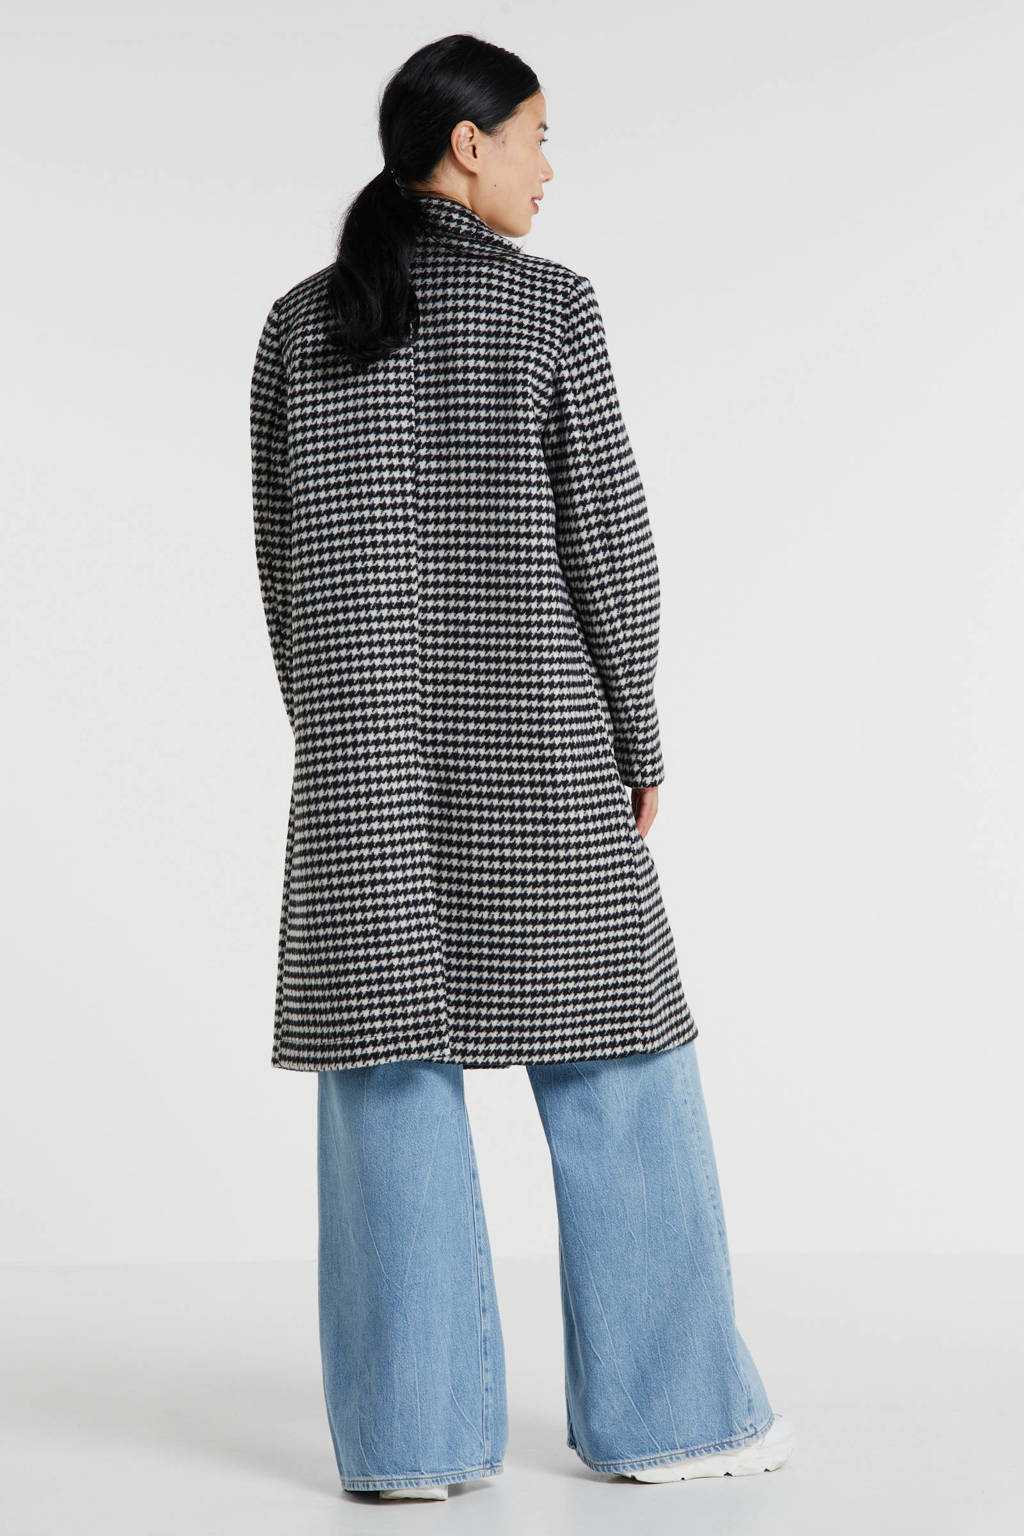 Scotch & Soda coat met pied-de-poule zwart/wit, Zwart/wit